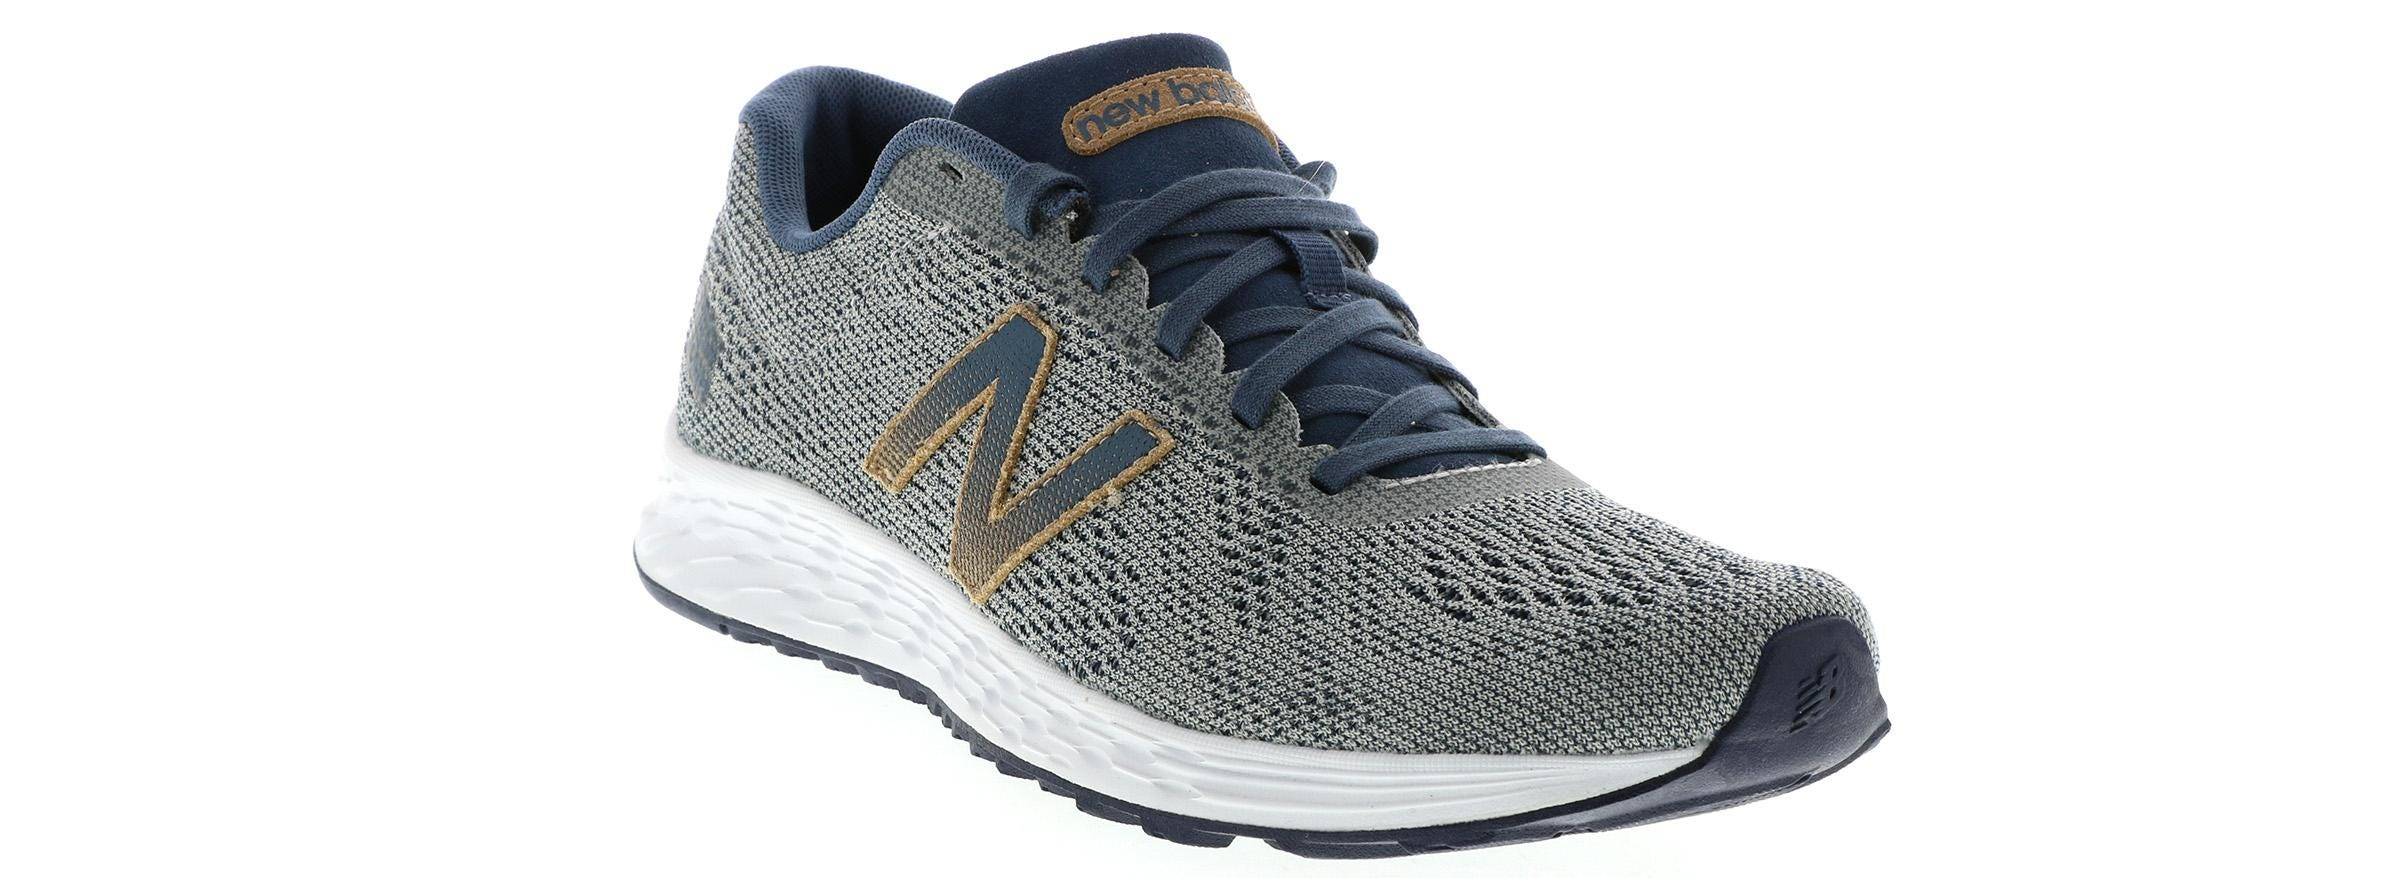 innovative design 7d14c d7544 Men's New Balance Fresh Foam Arishi 4E Wide Navy | Shoe ...